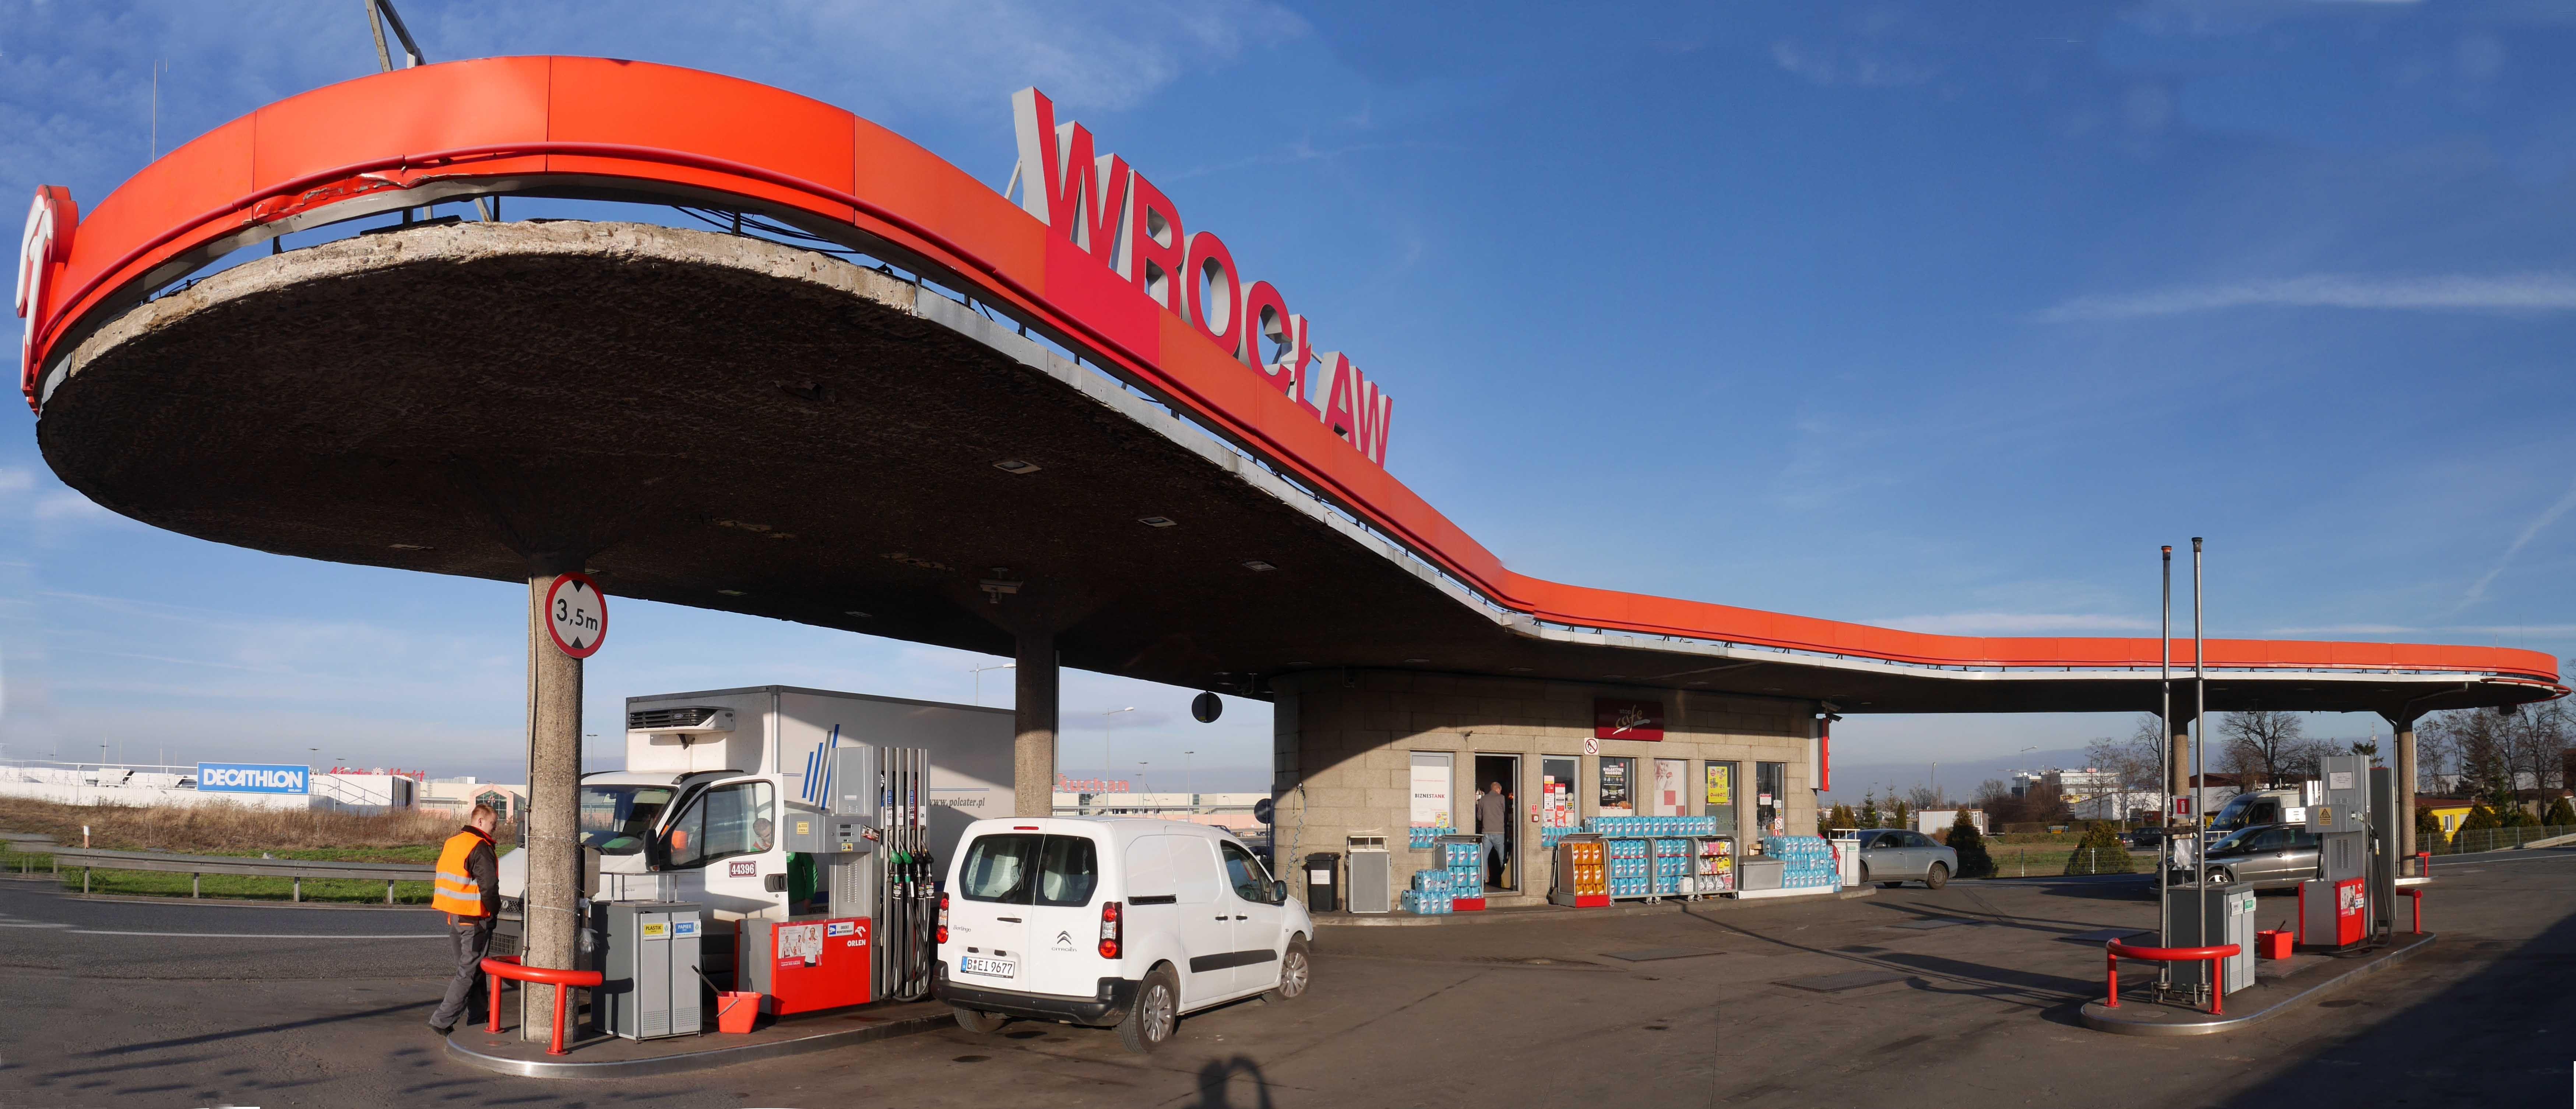 Tankstelle breslau modell f rstenwalde gas station for Bauhaus architektur heute